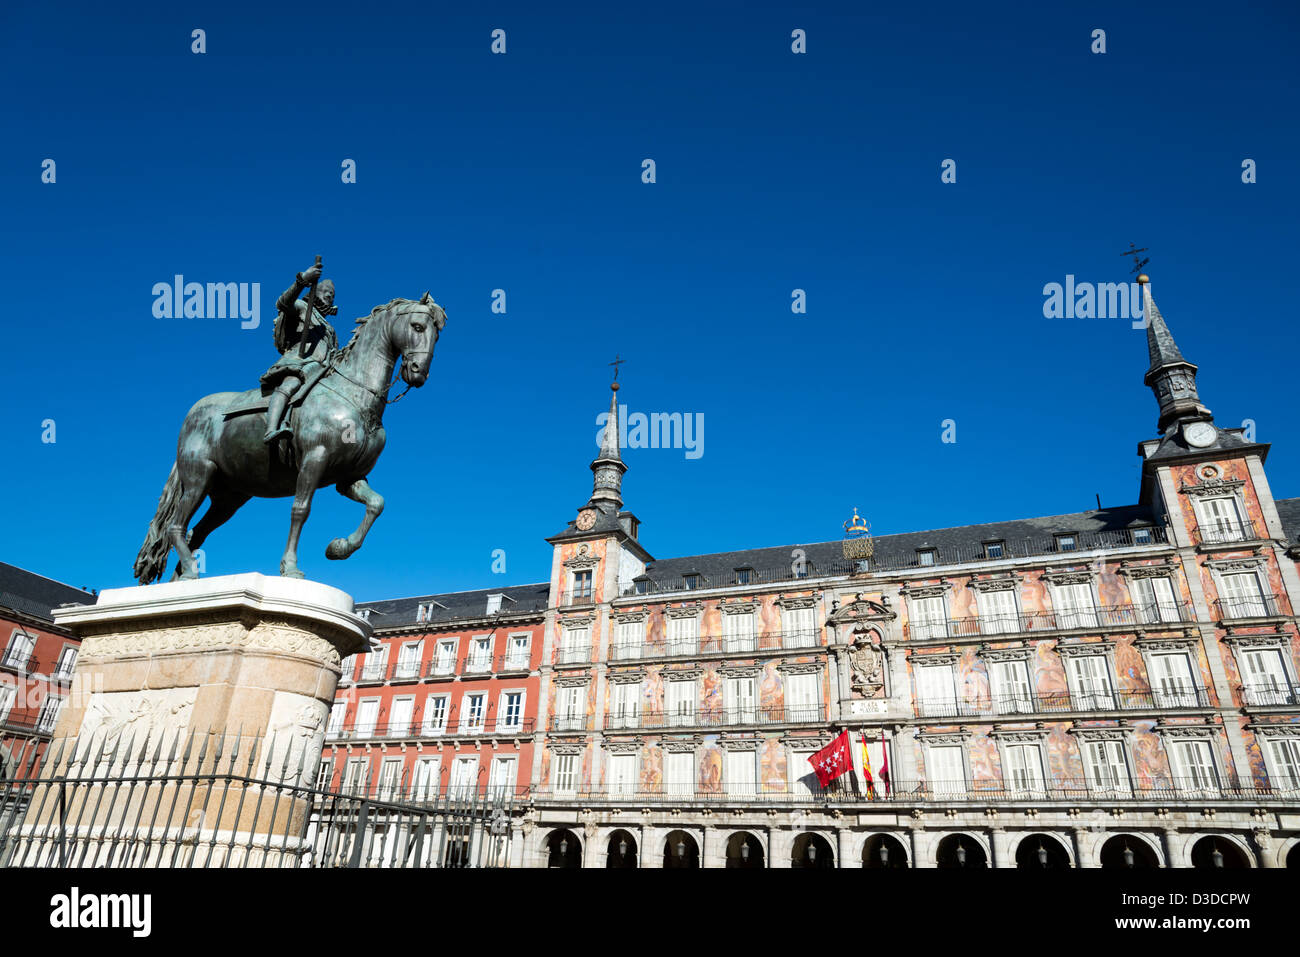 Equestrian statue of Philip III on the Plaza Mayor, Madrid, Spain - Stock Image